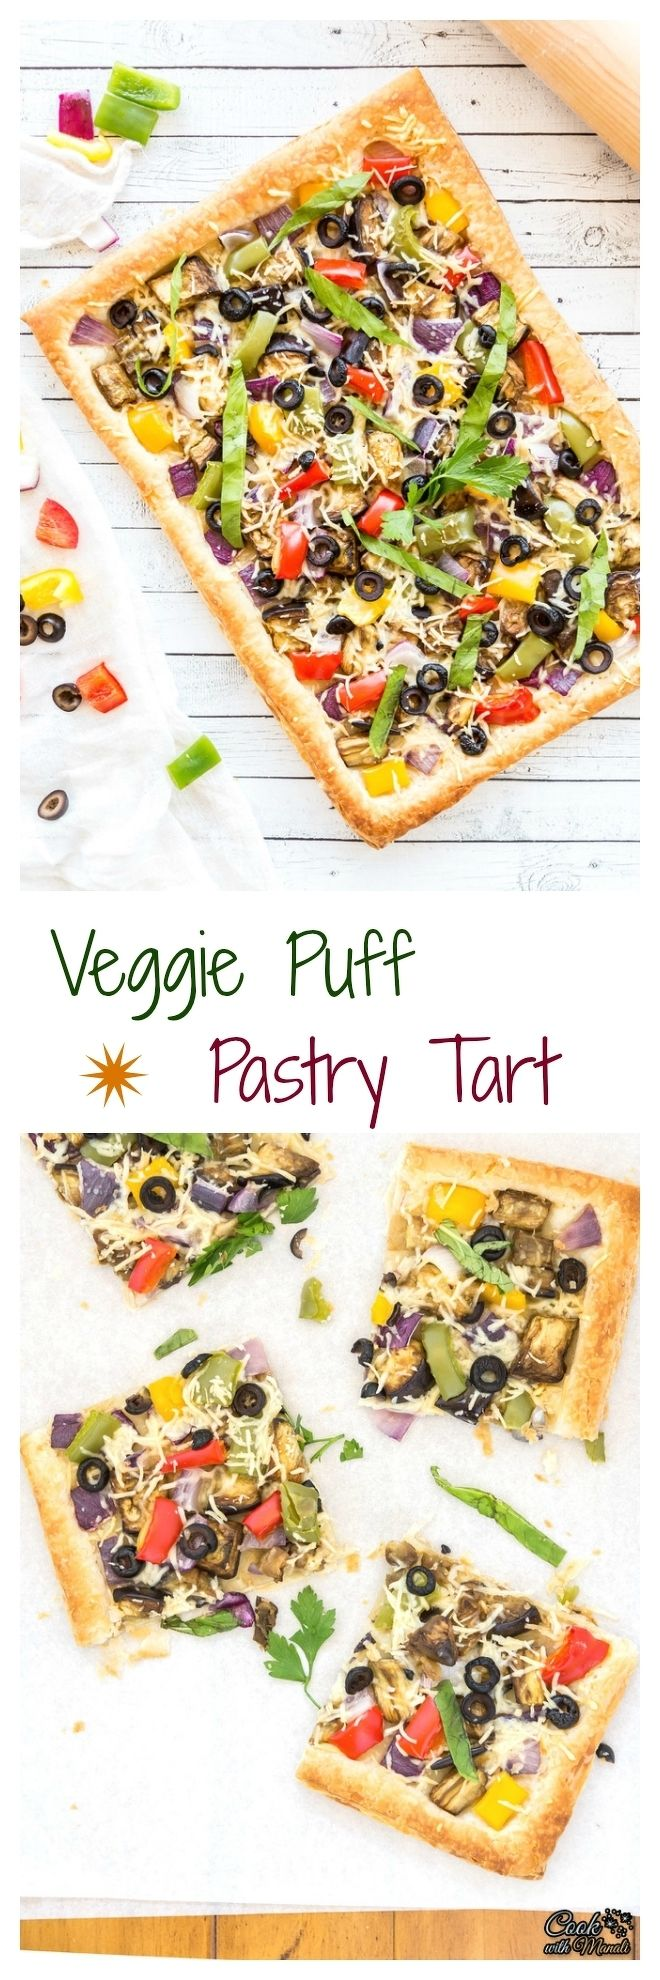 Vegetarian Puff Pastry Tart Collage-nocwm